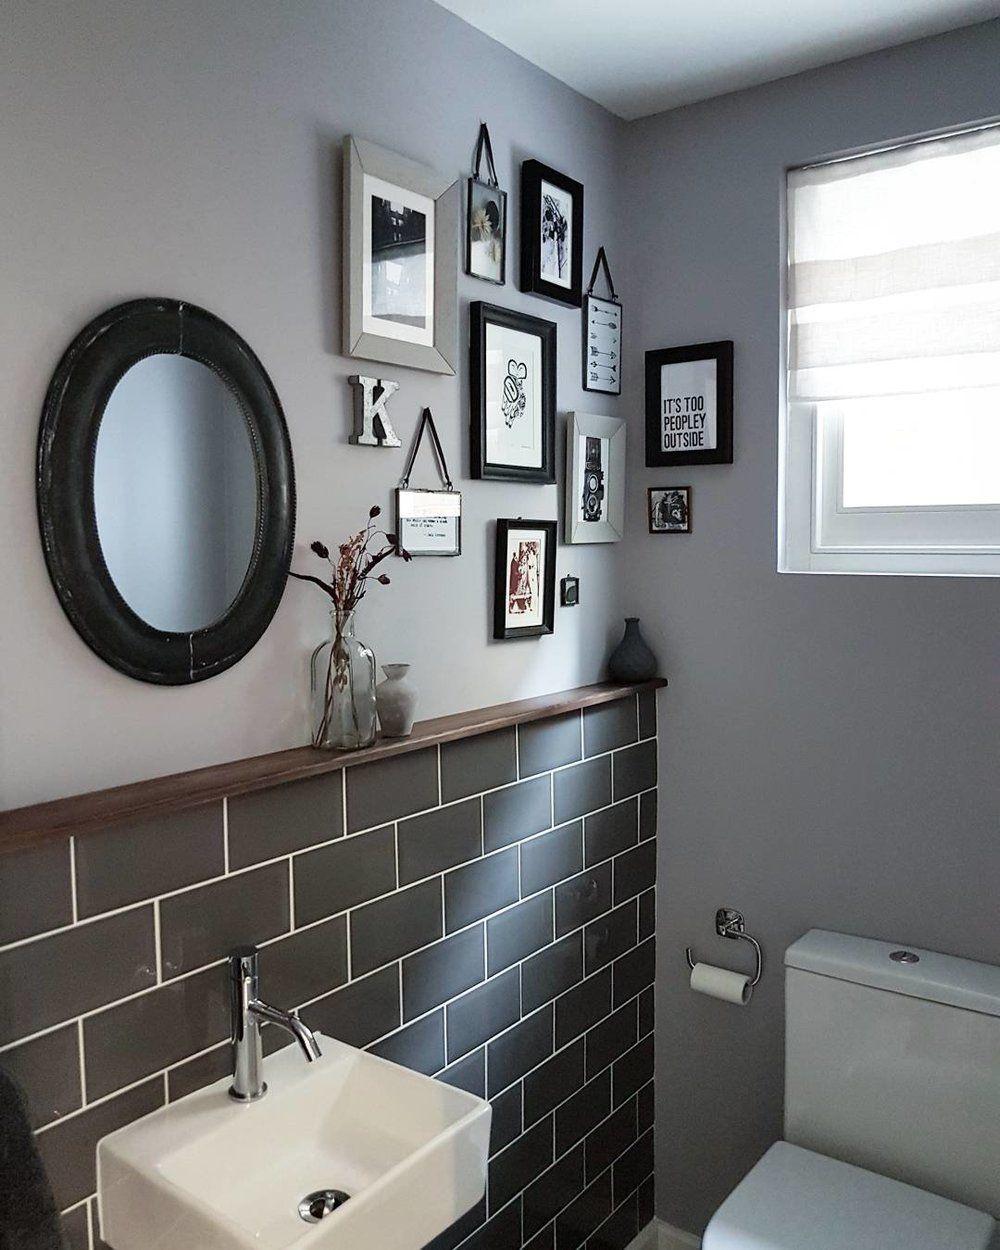 'Sassy Homestyle' Host Kristine's beautifully renovated home. — HORNSBY STYLE #smalltoiletroom